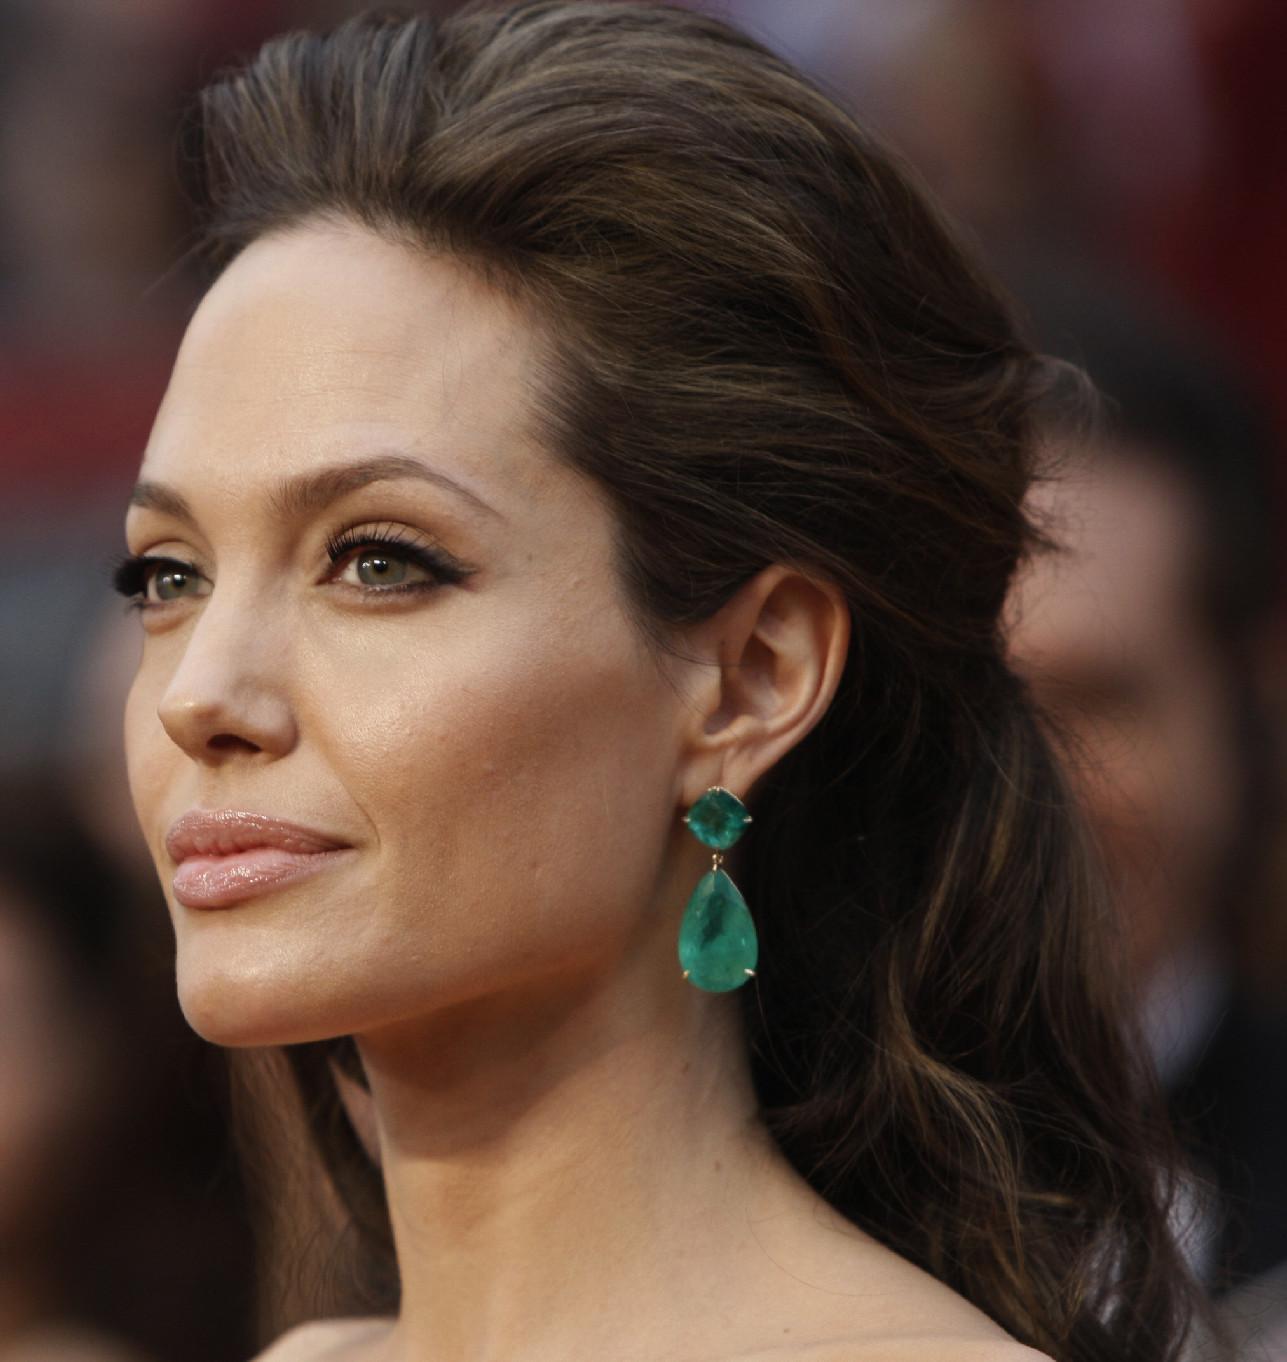 angelina-jolie-earrings-emerald